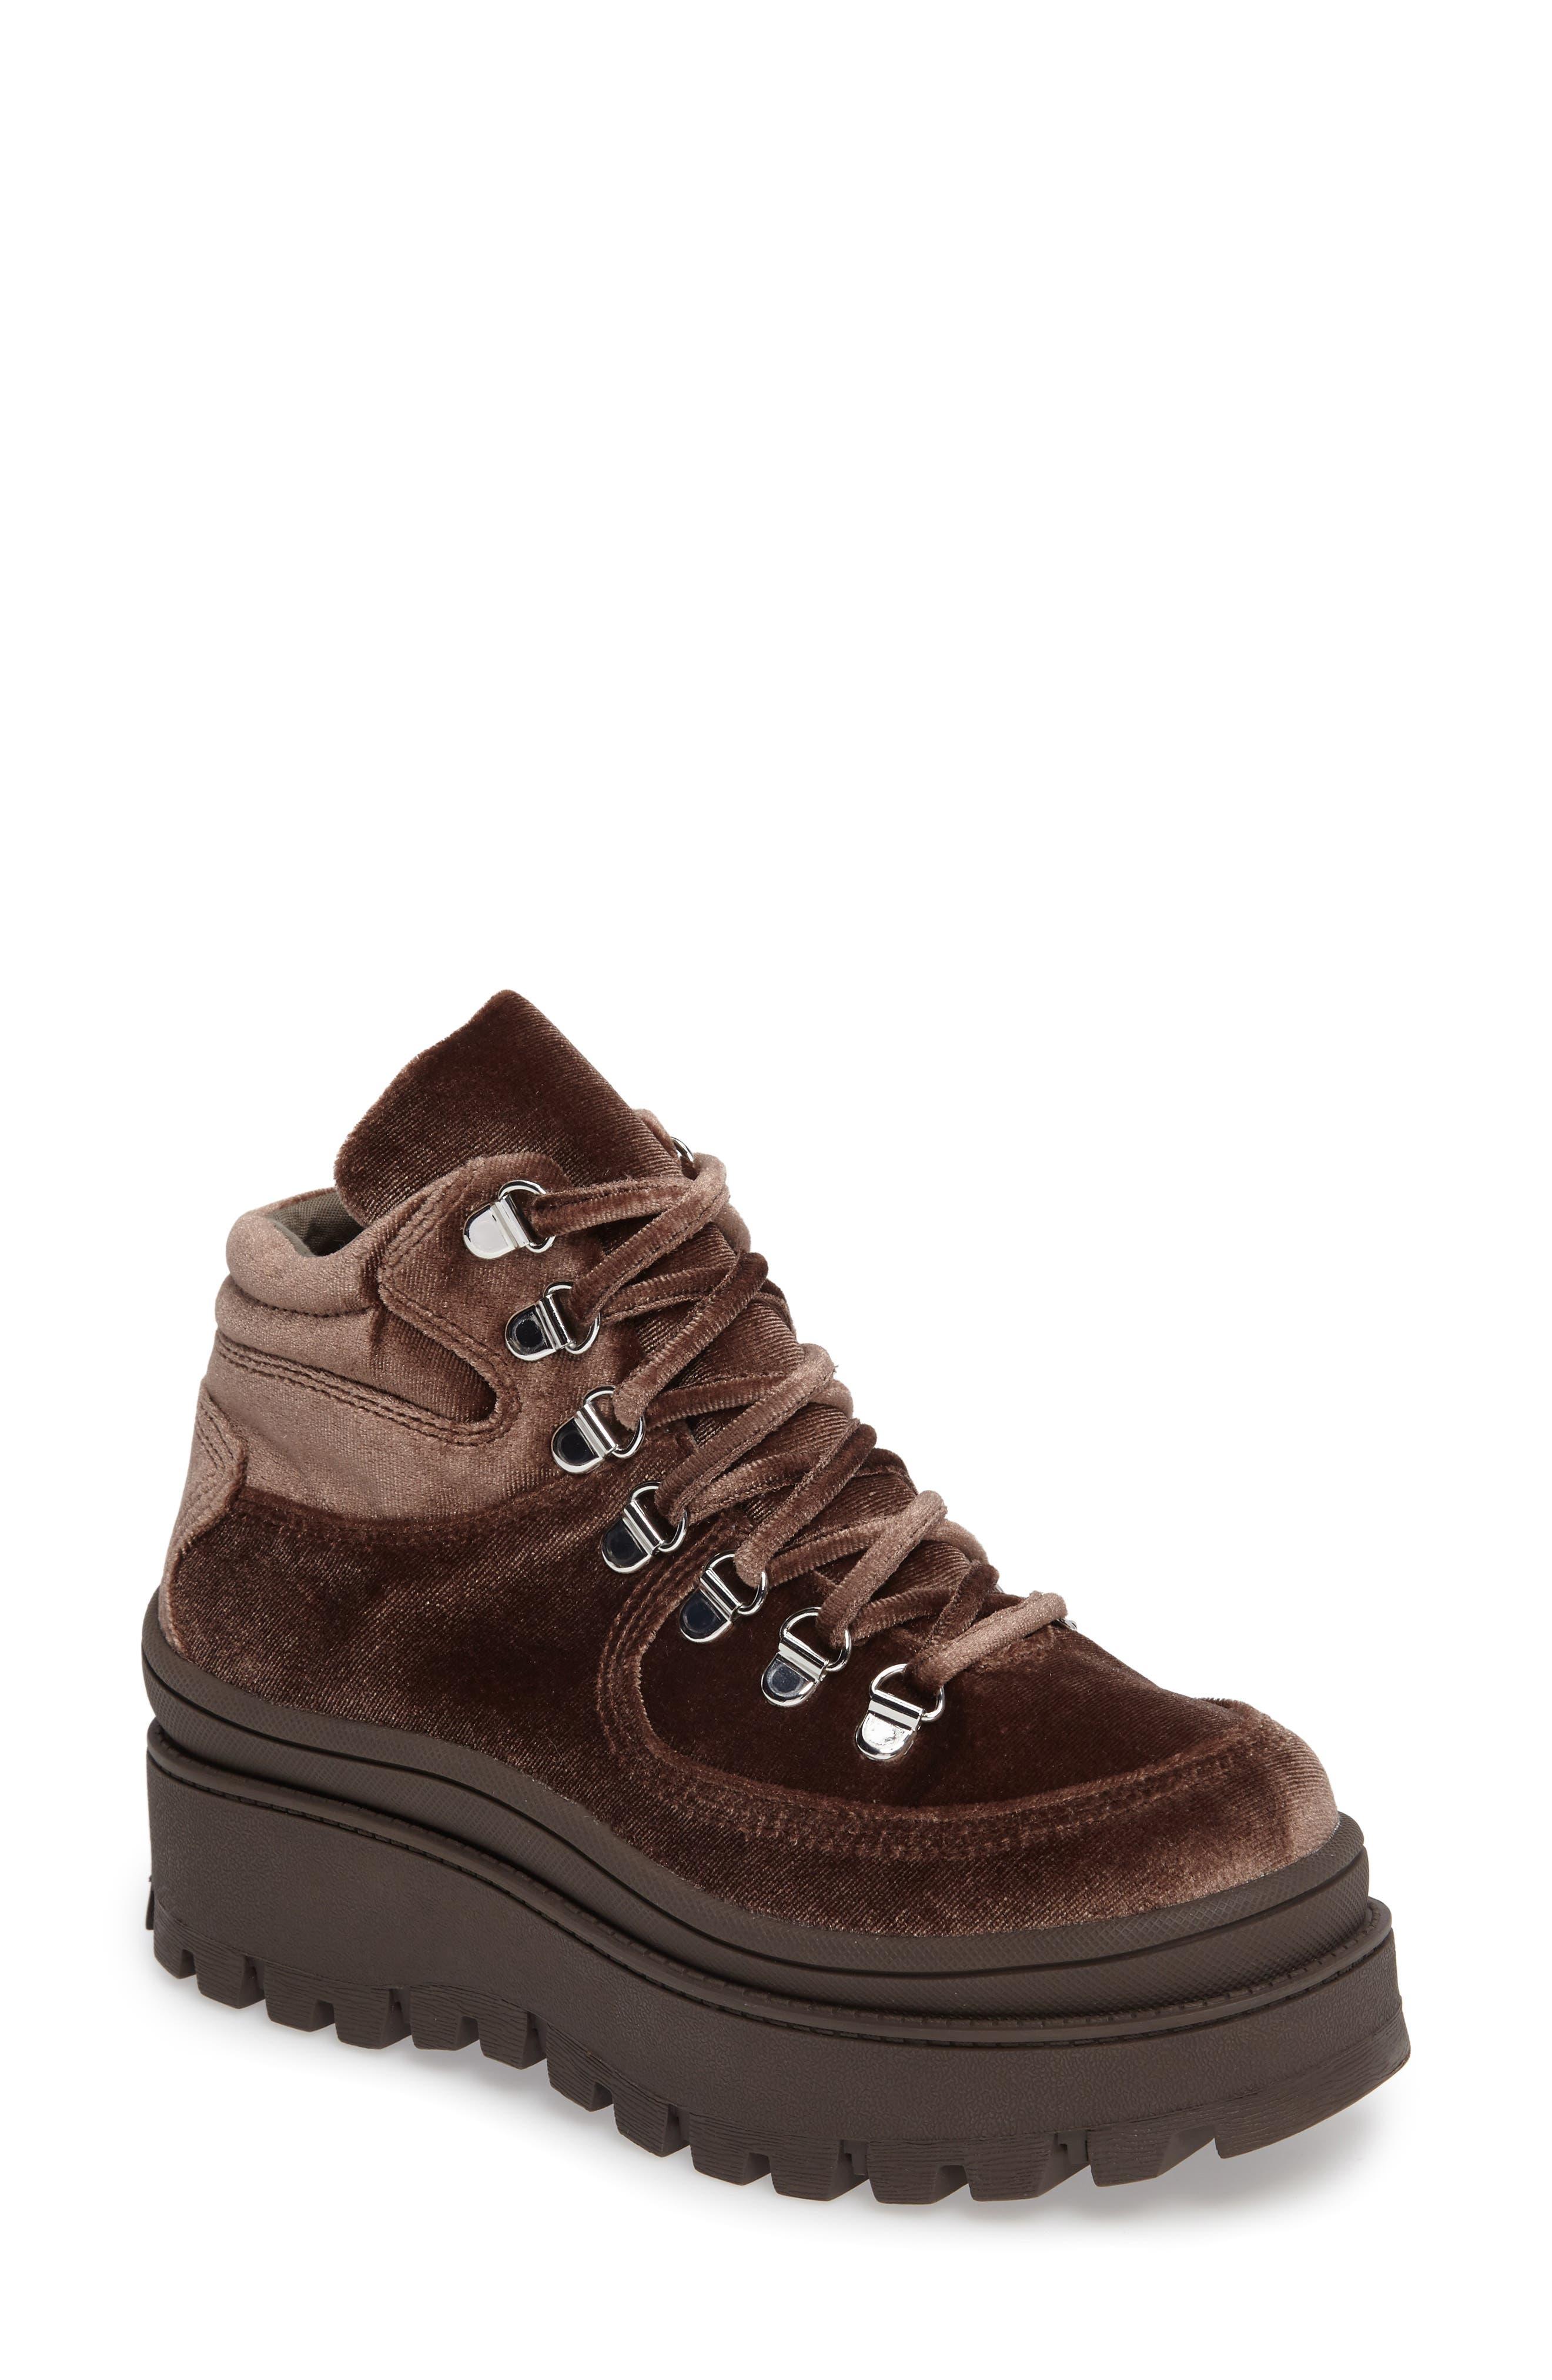 Alternate Image 1 Selected - Jeffrey Campbell Top Peak Platform Sneaker (Women)